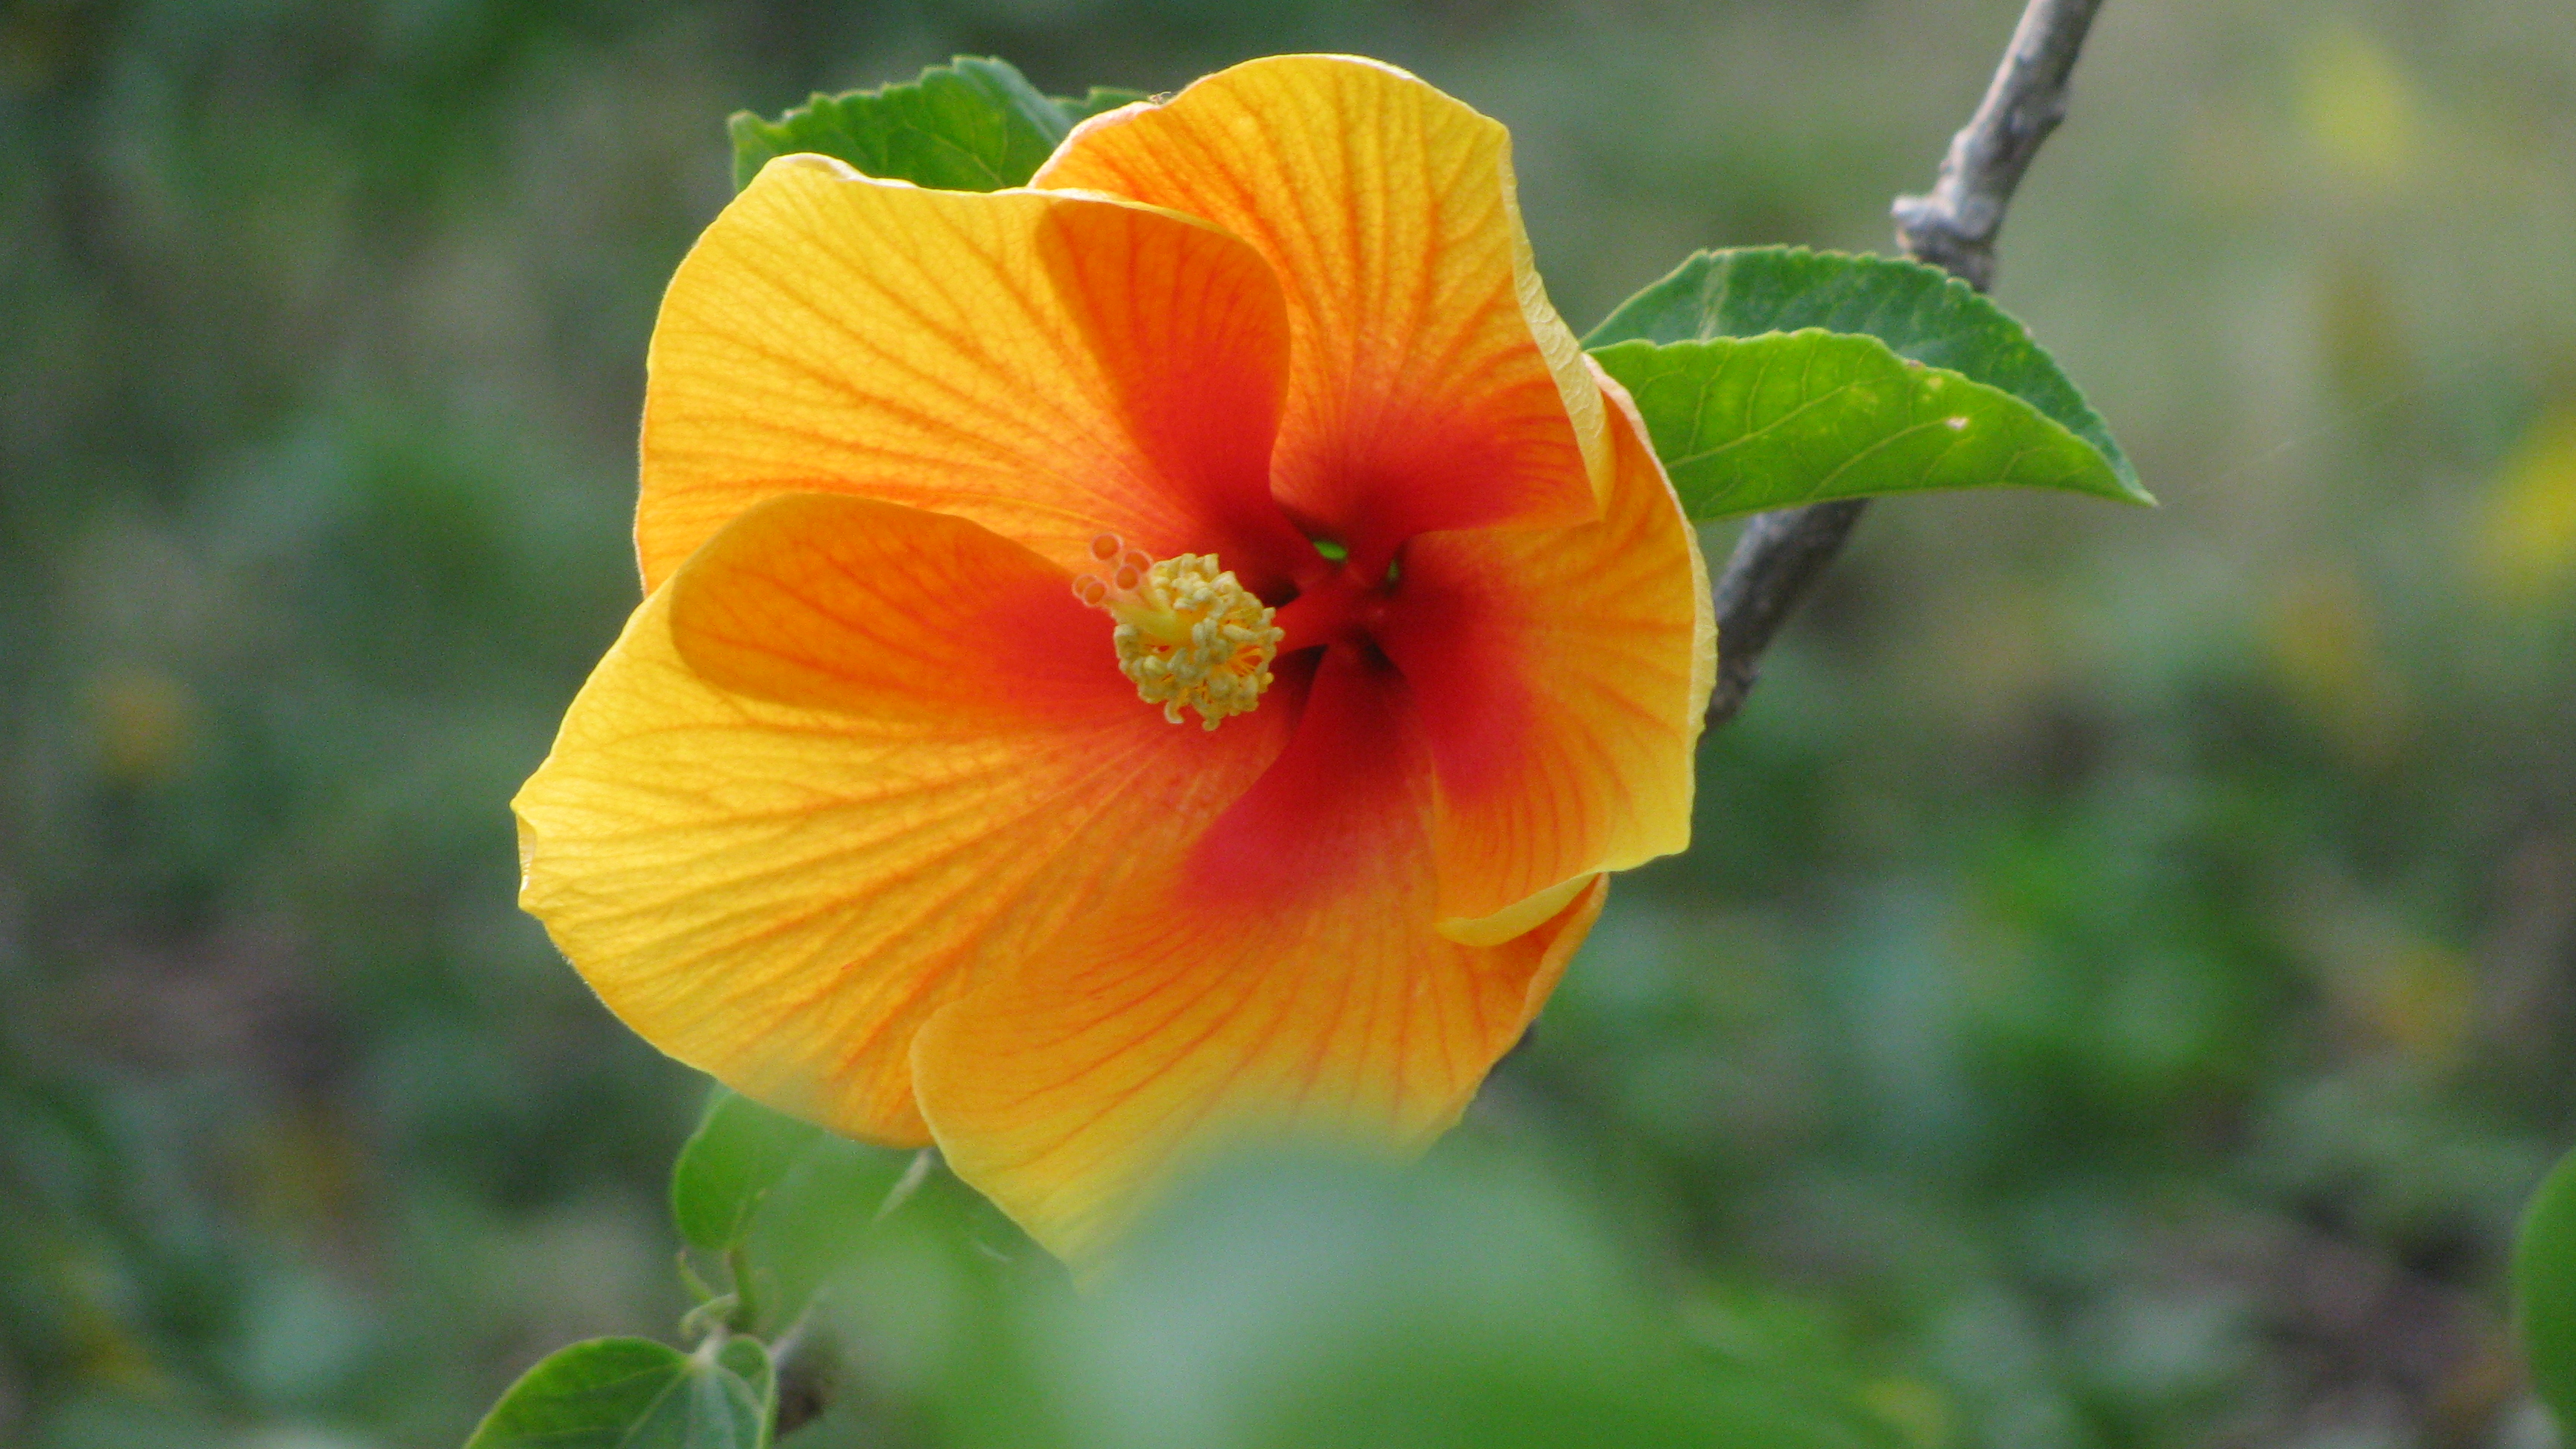 A Flower For Your Desktop